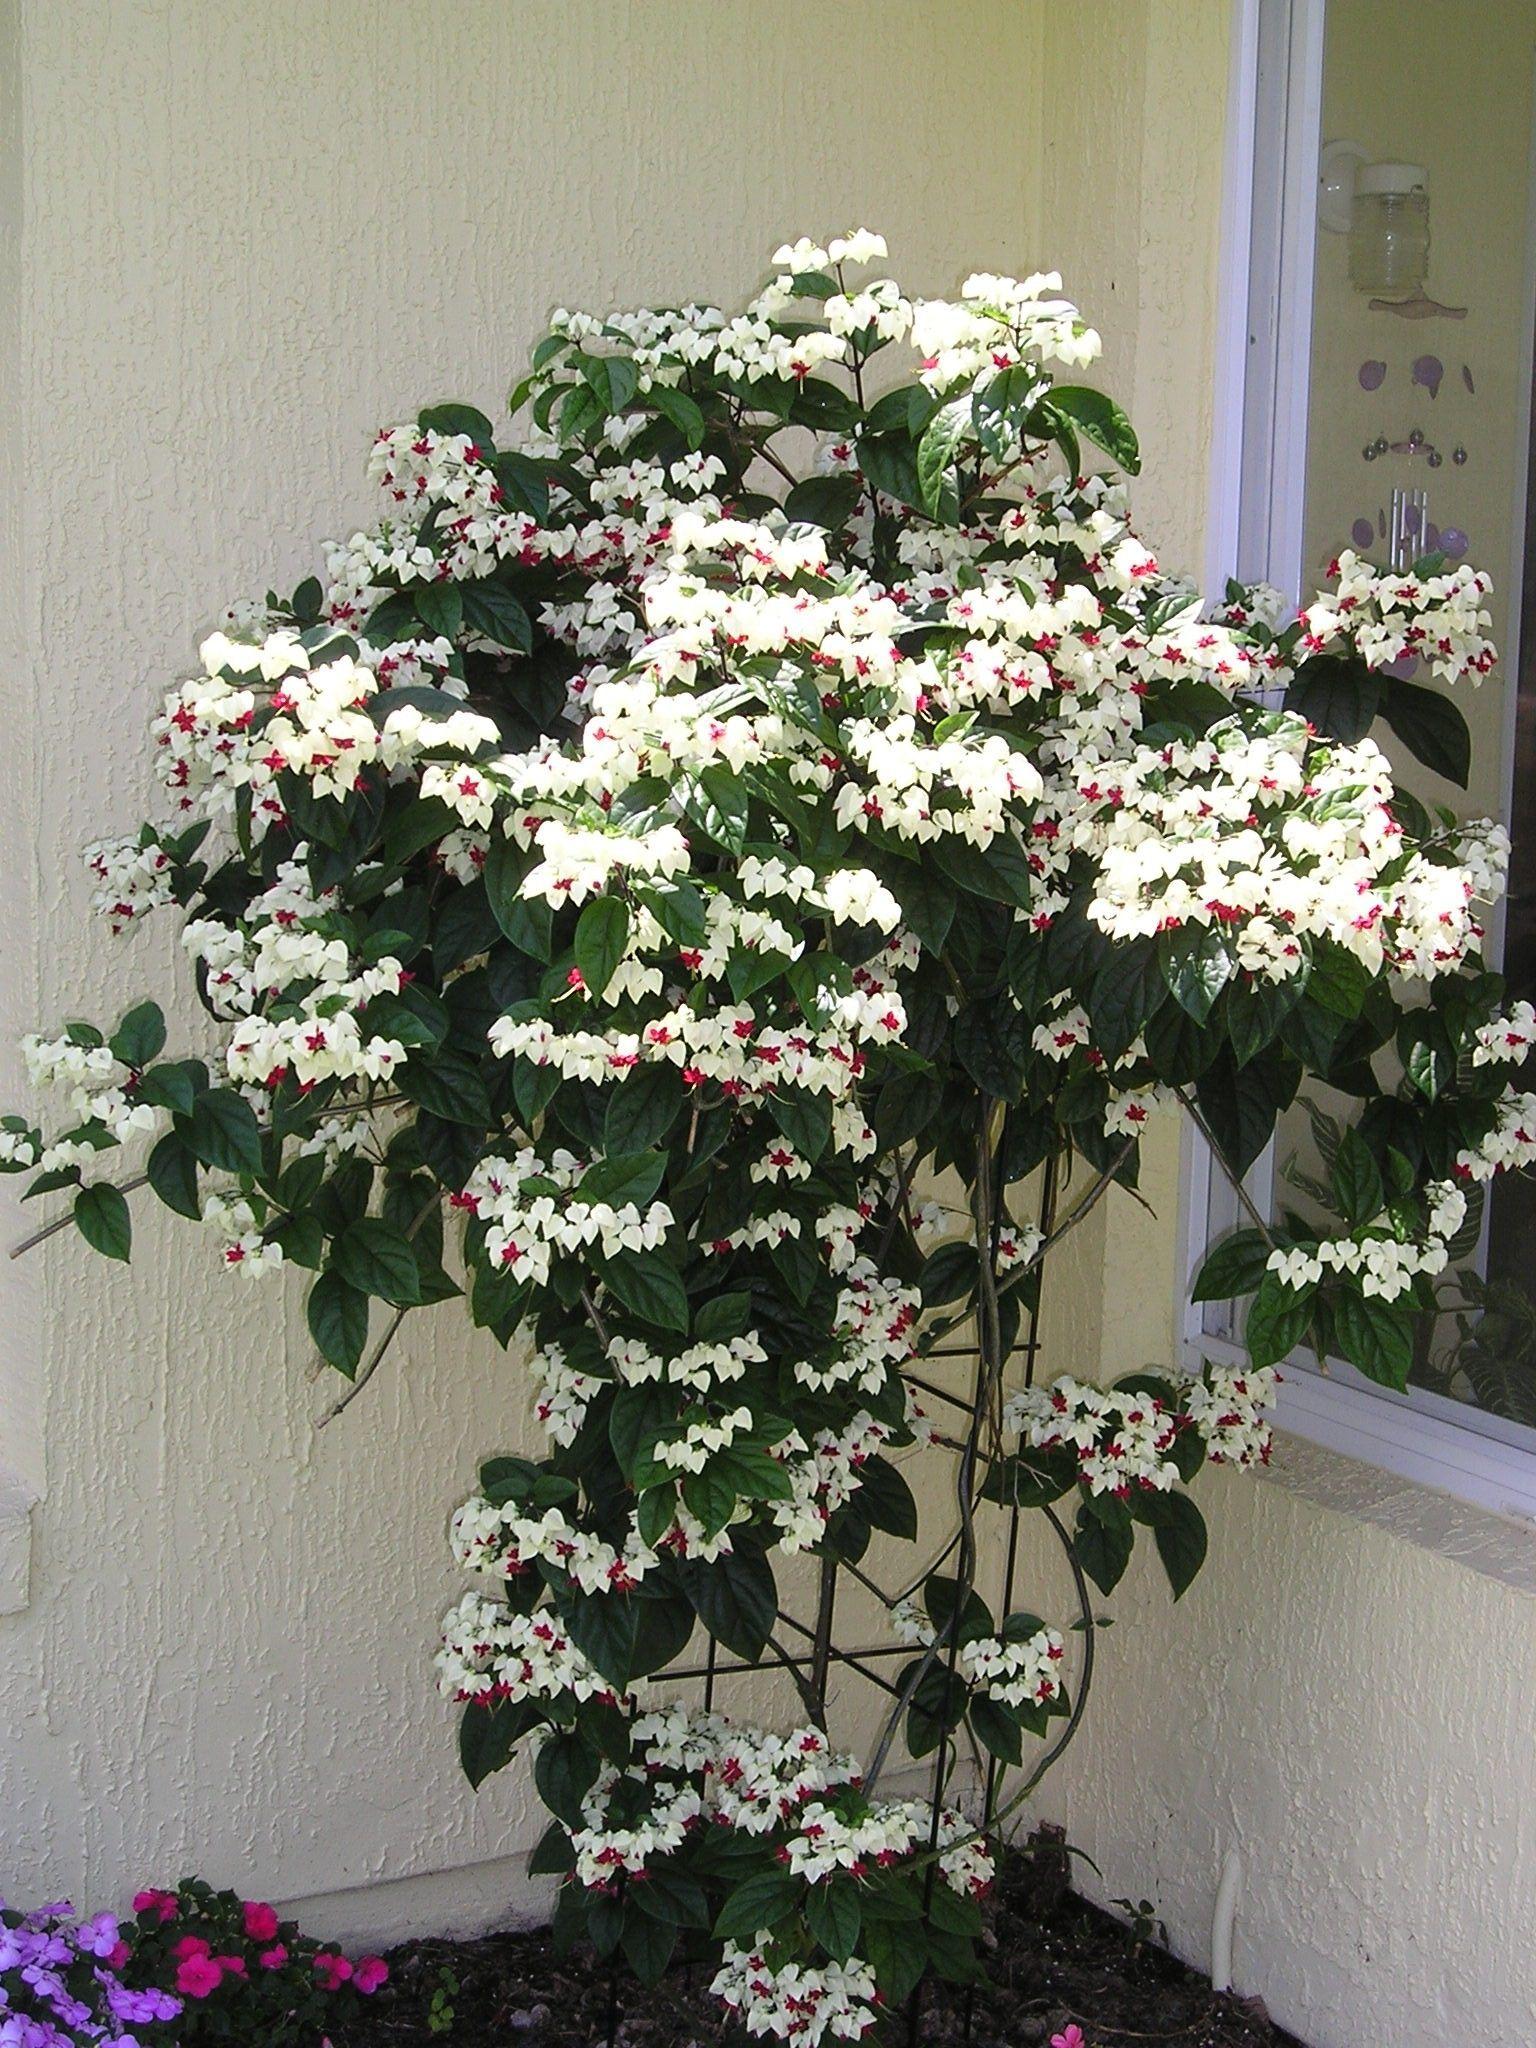 Pin by Montri Thanadkha on Flowering shrubs Pinterest Flowering